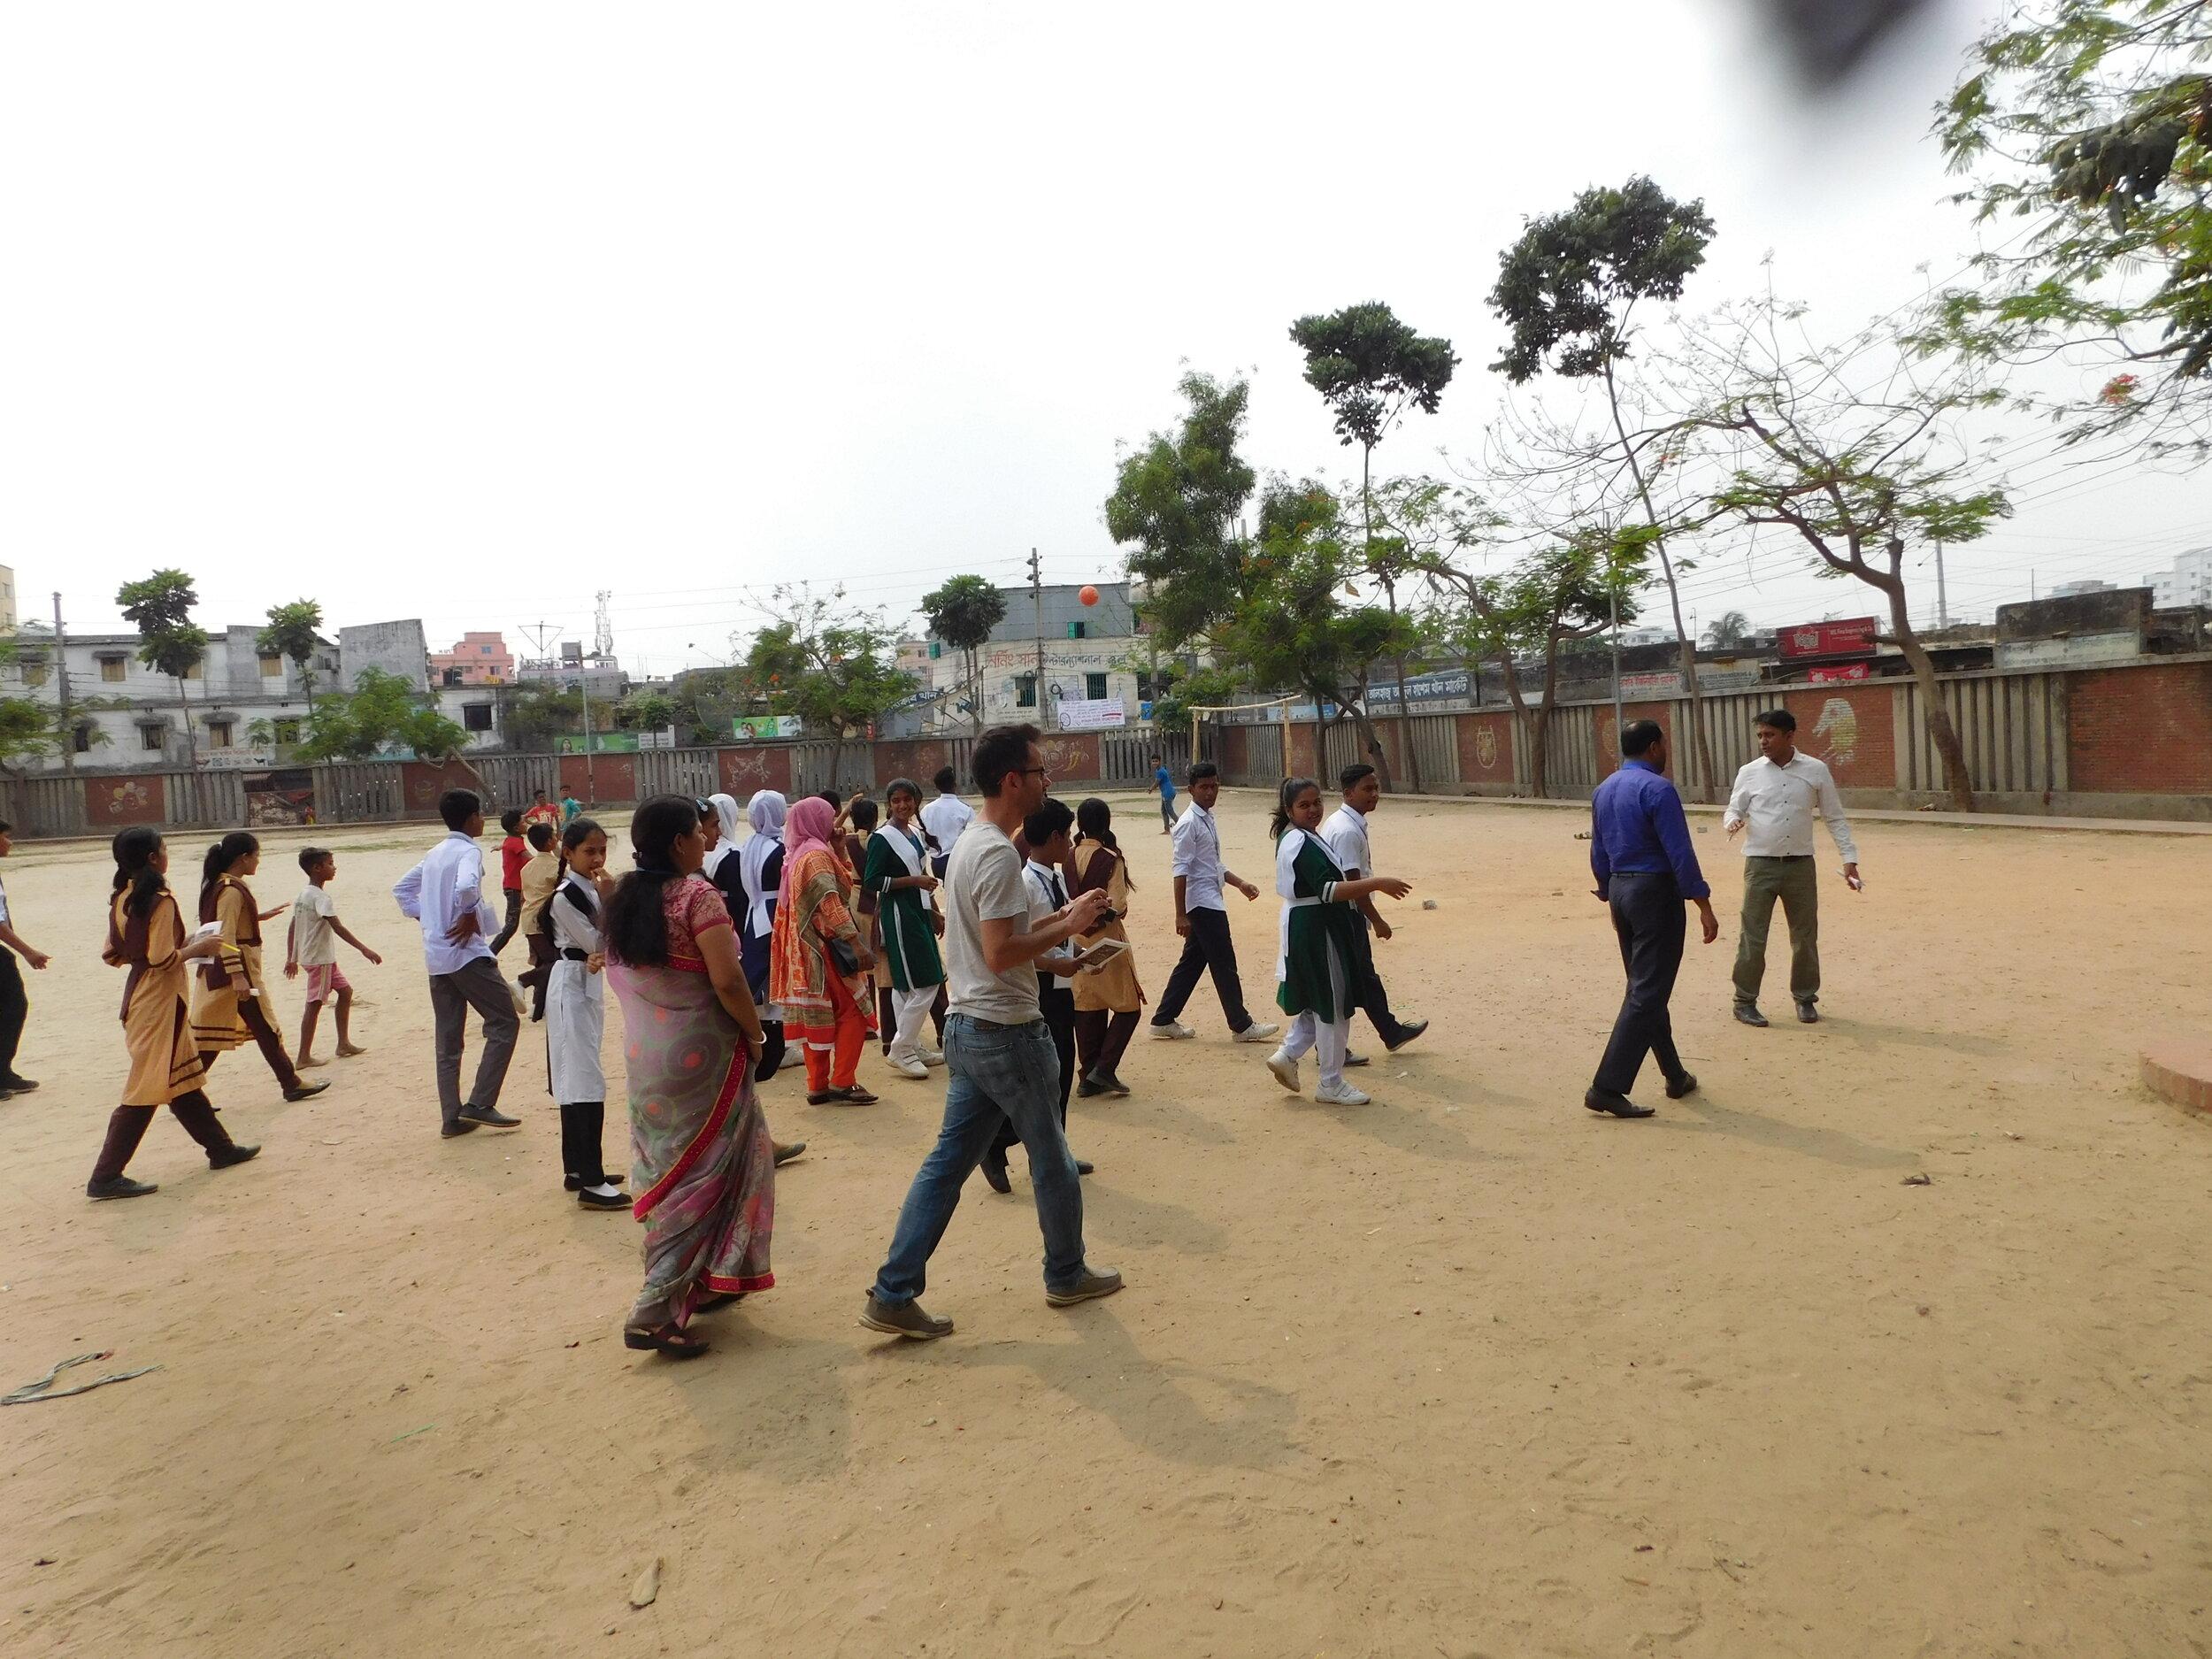 Local residents survey the open space during a site visit. Credit: UN-Habitat